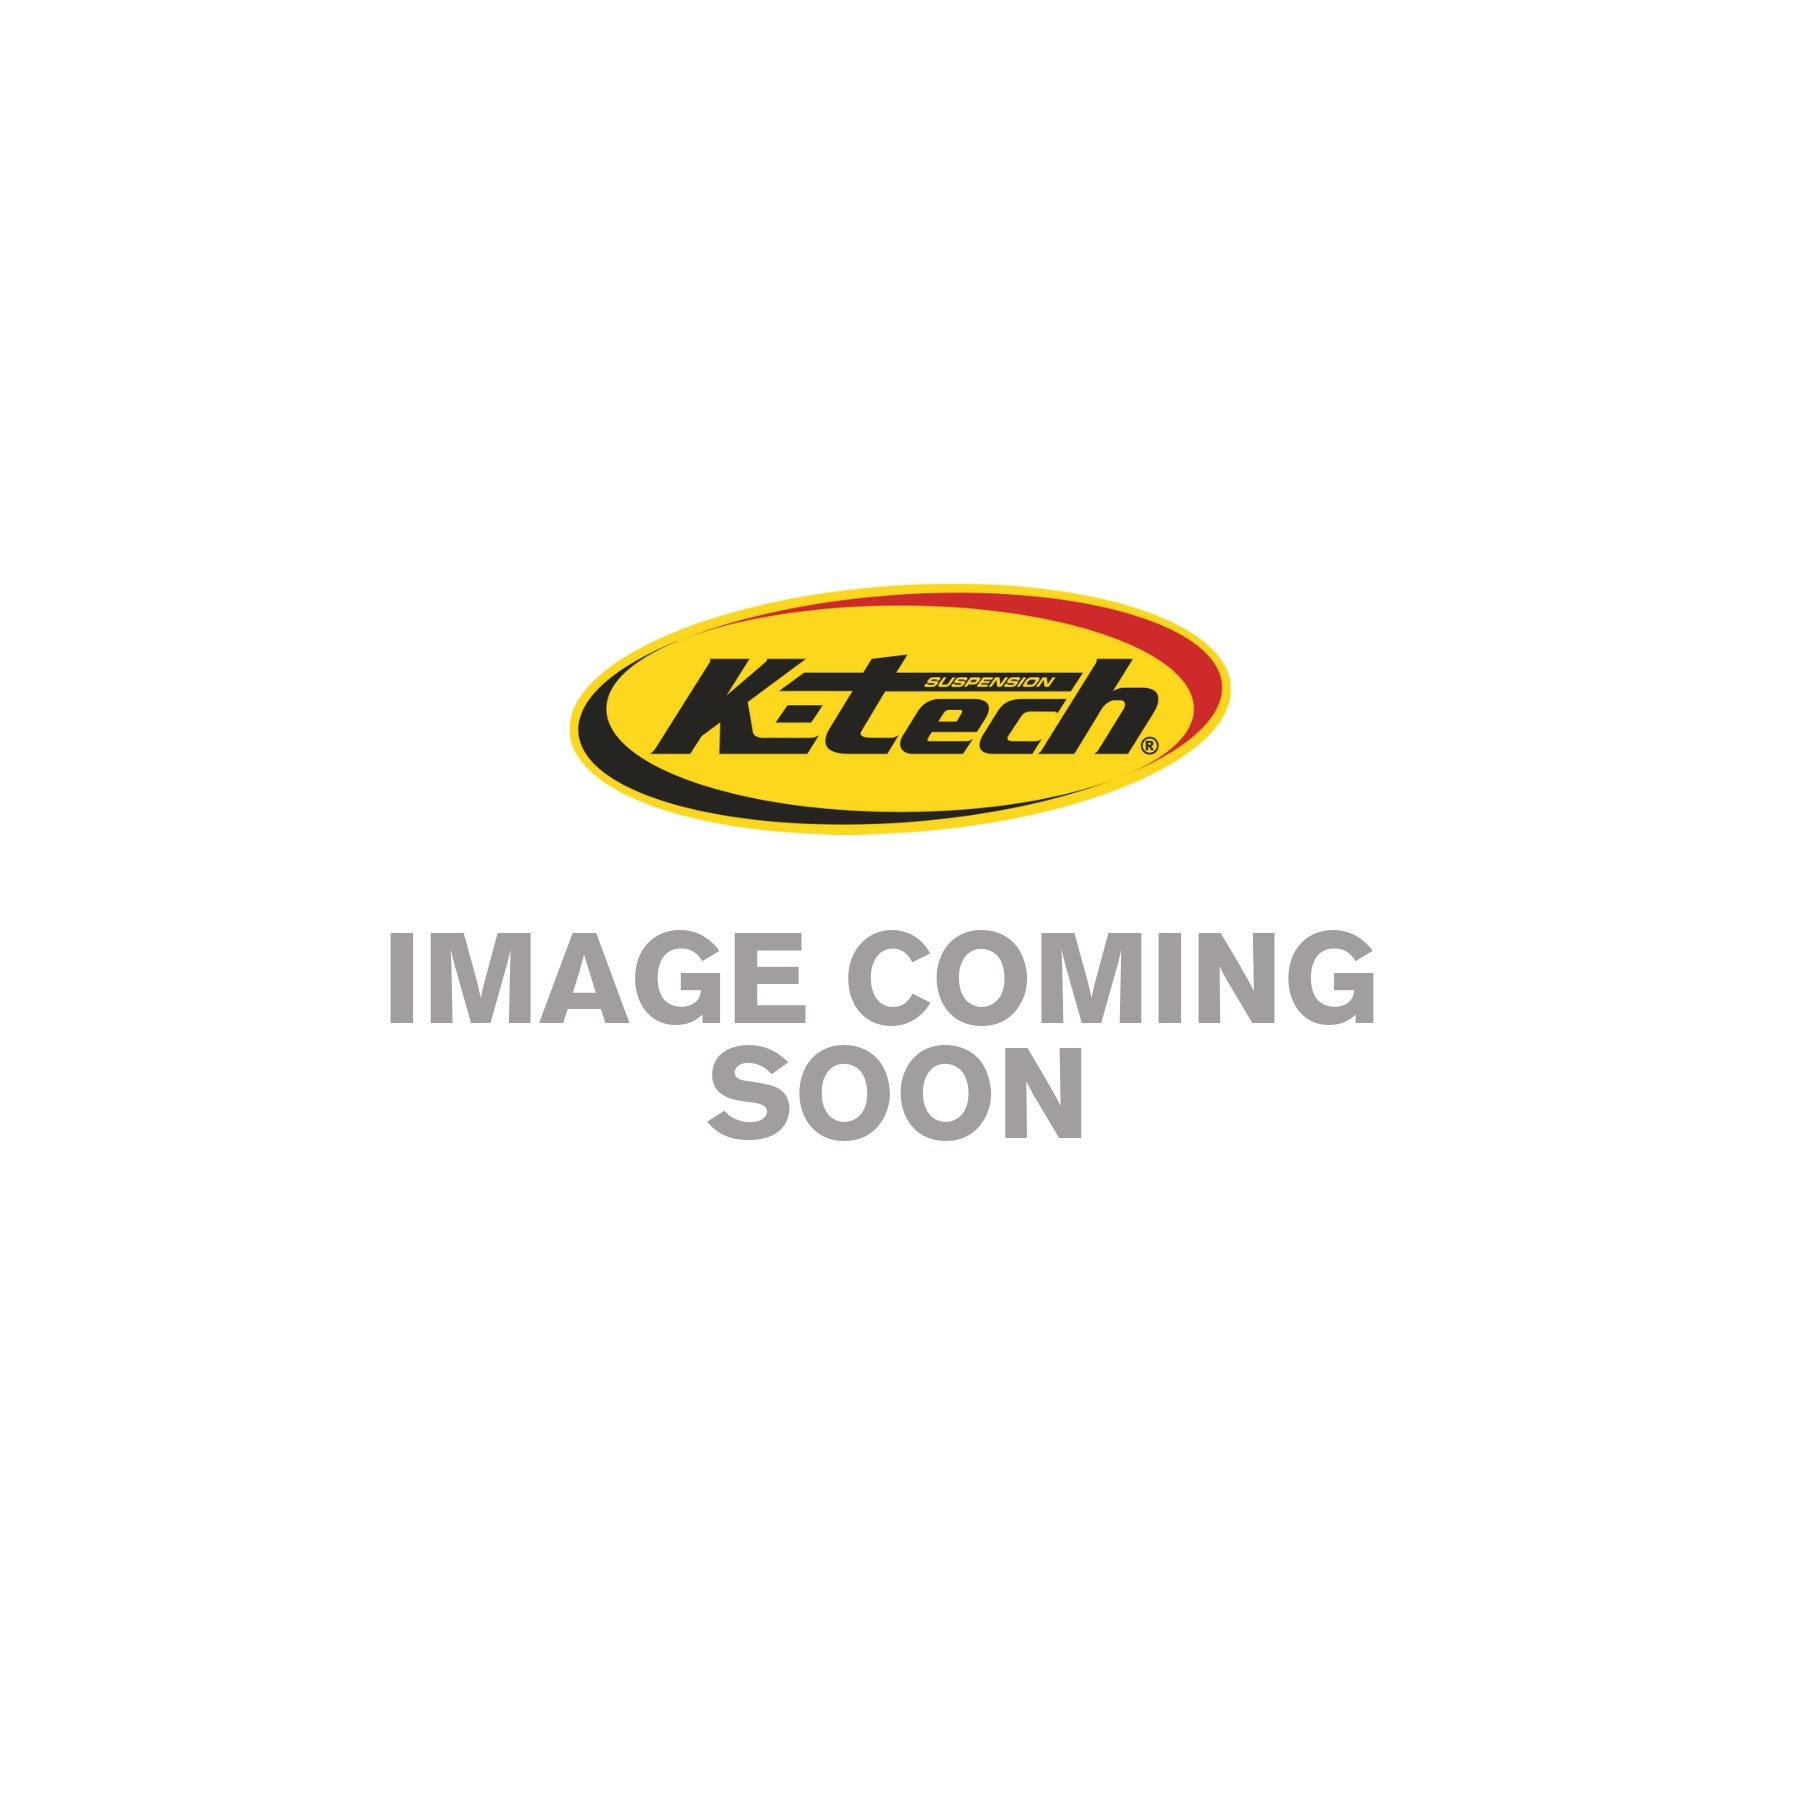 Shock Absorber Seal Head Lowering Insert KYB/SHOWA/WP 46mm -30mm